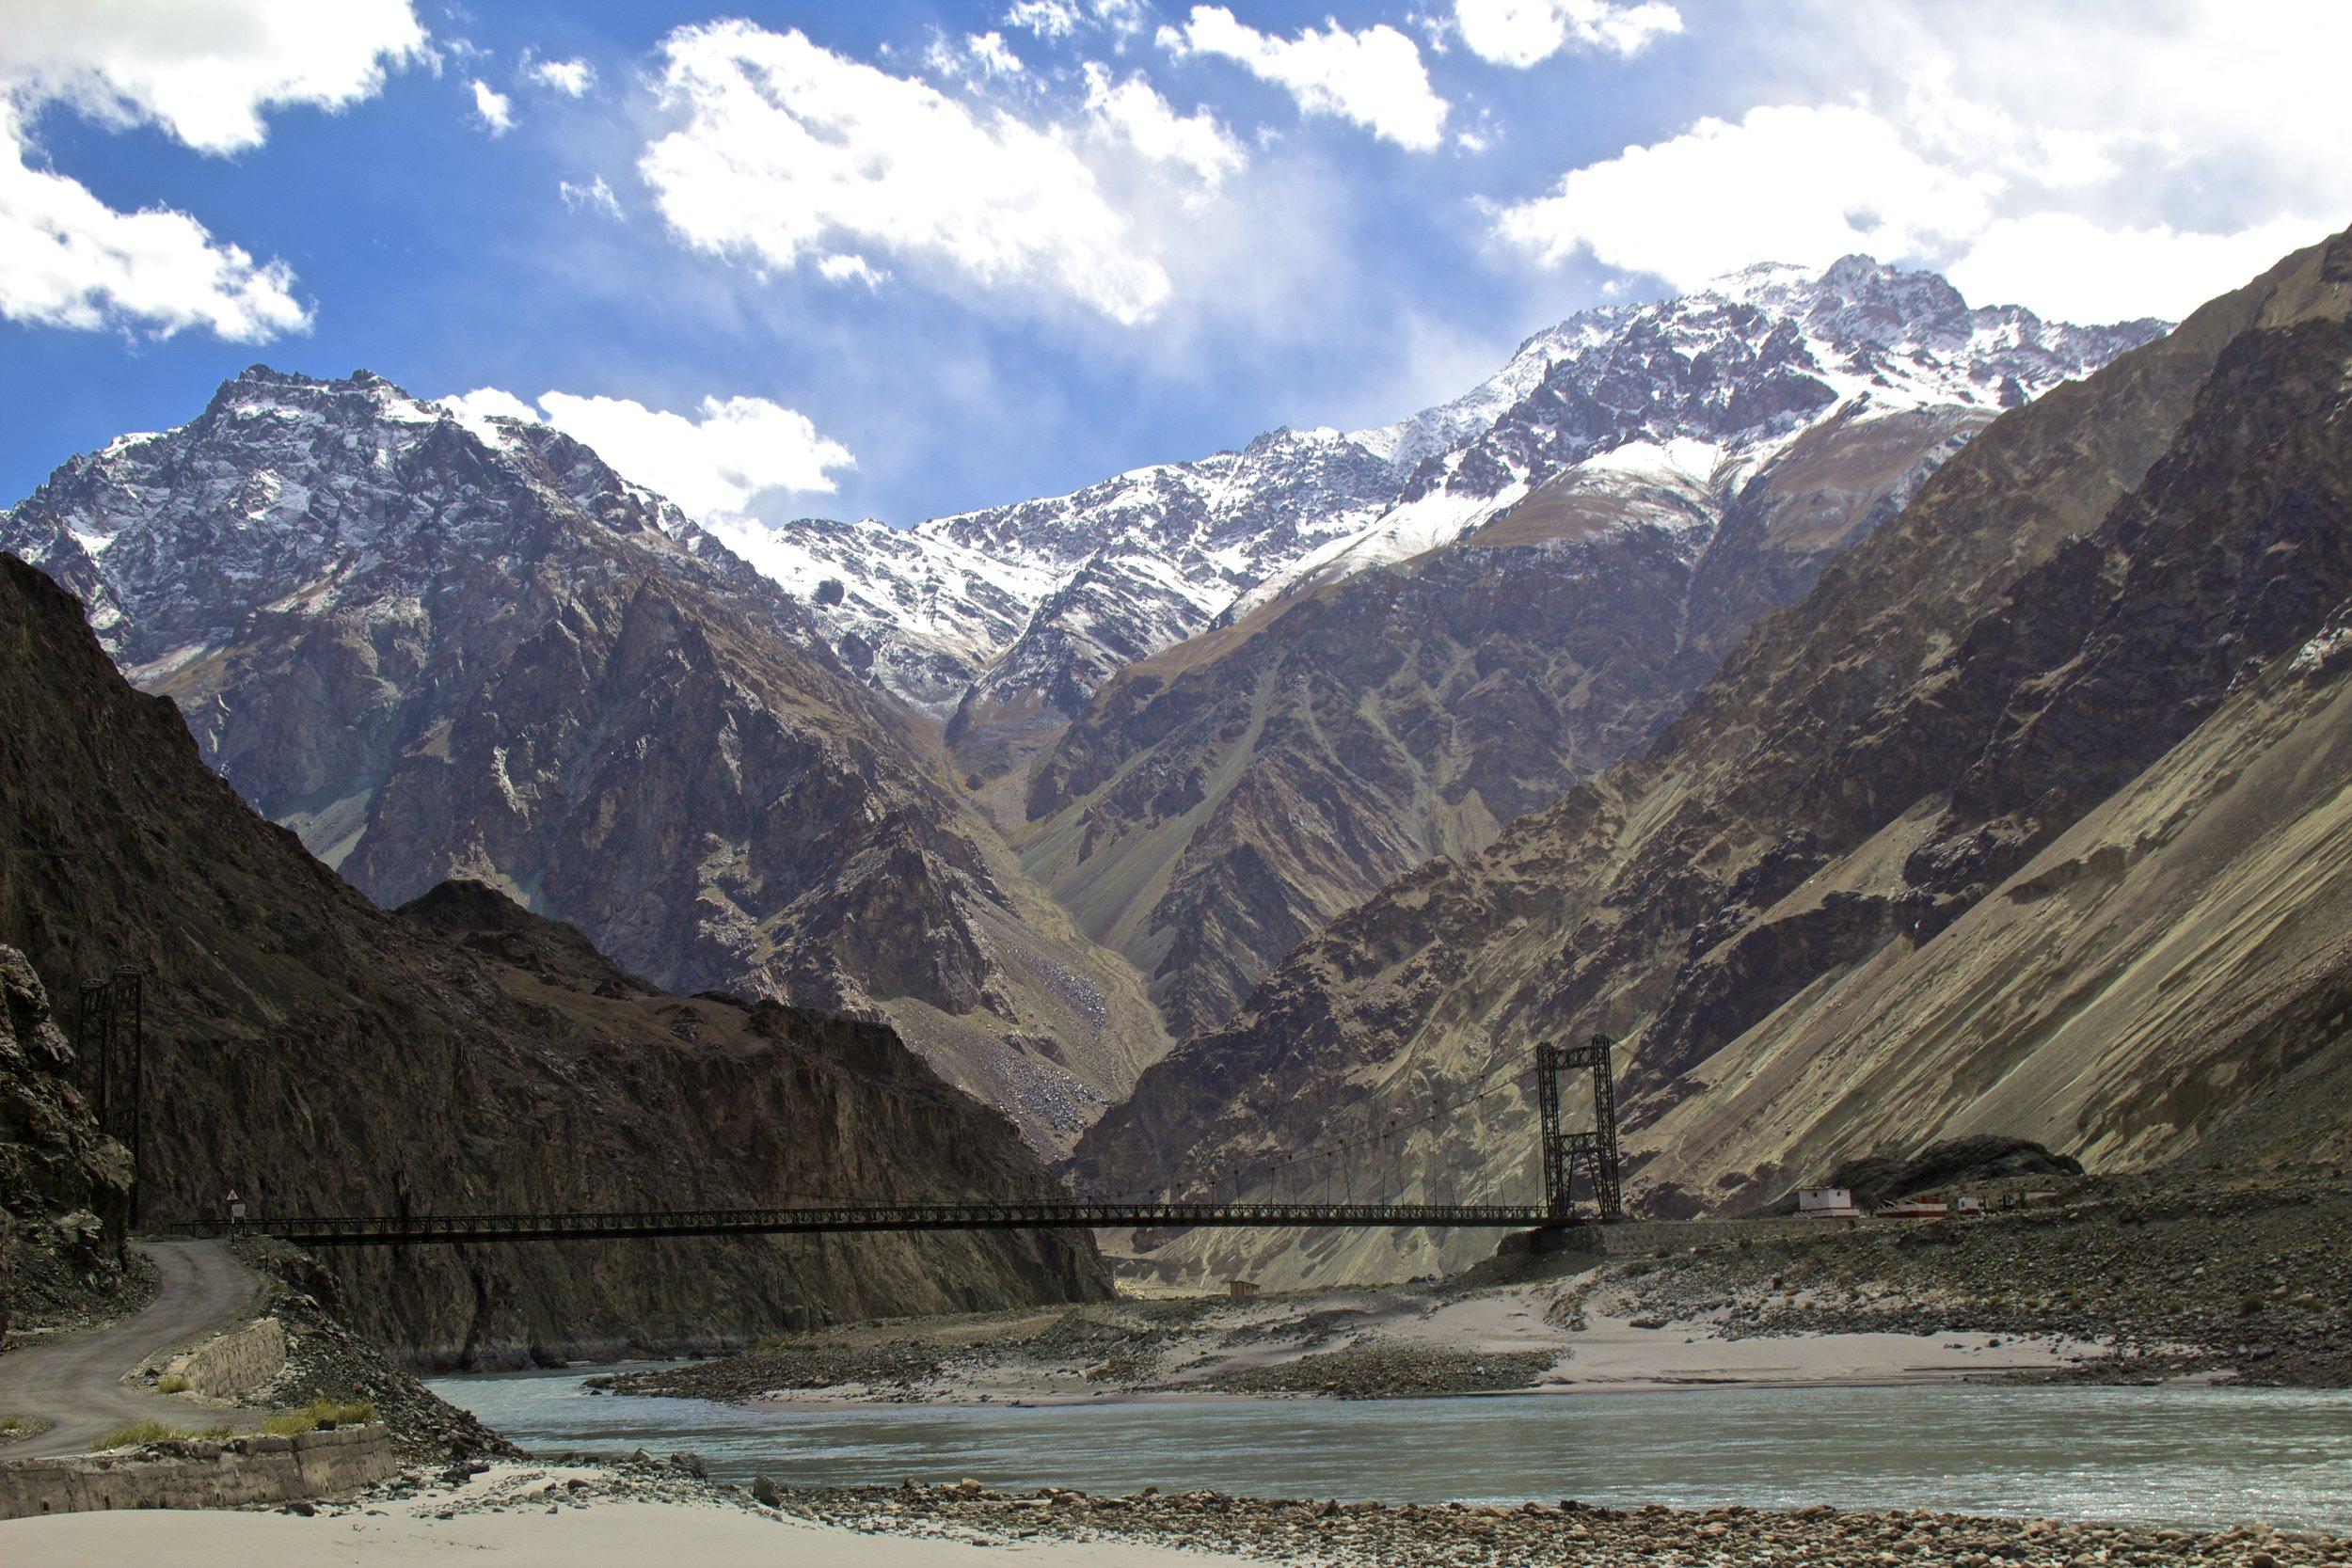 kashmir gilgit baltistan roads shyok river 2.jpg